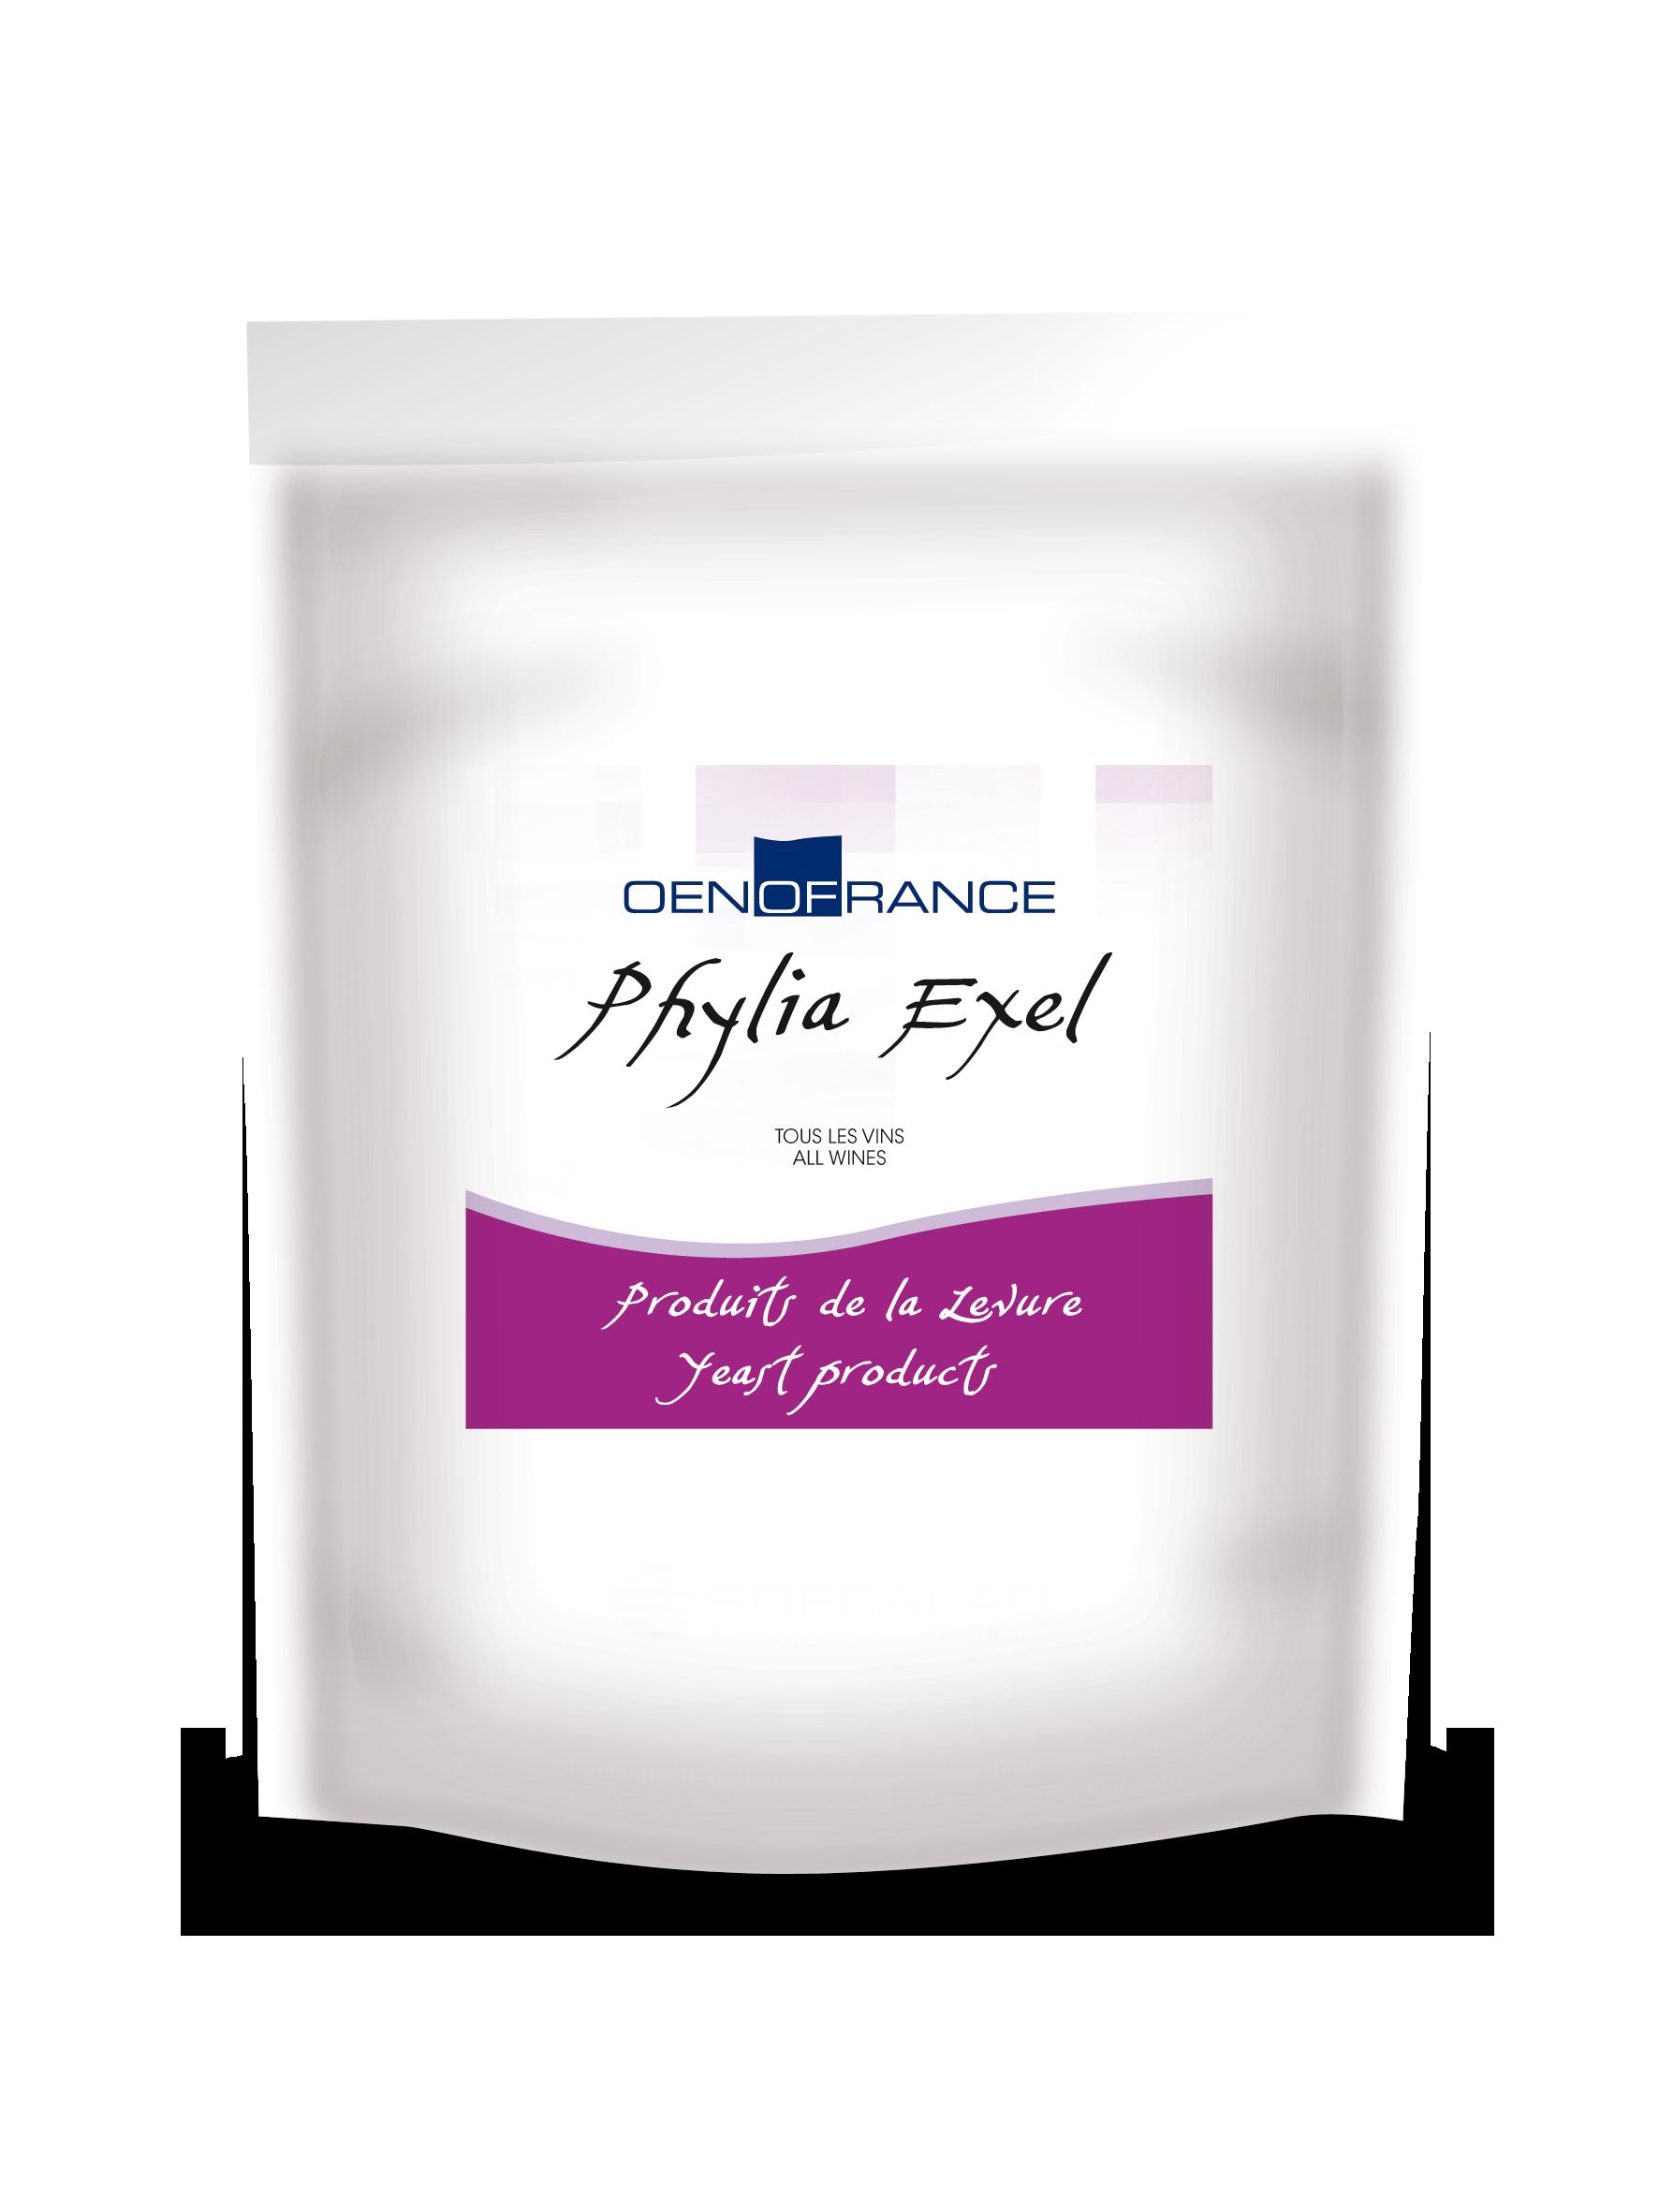 Phylia-Exel-NOSOF2015